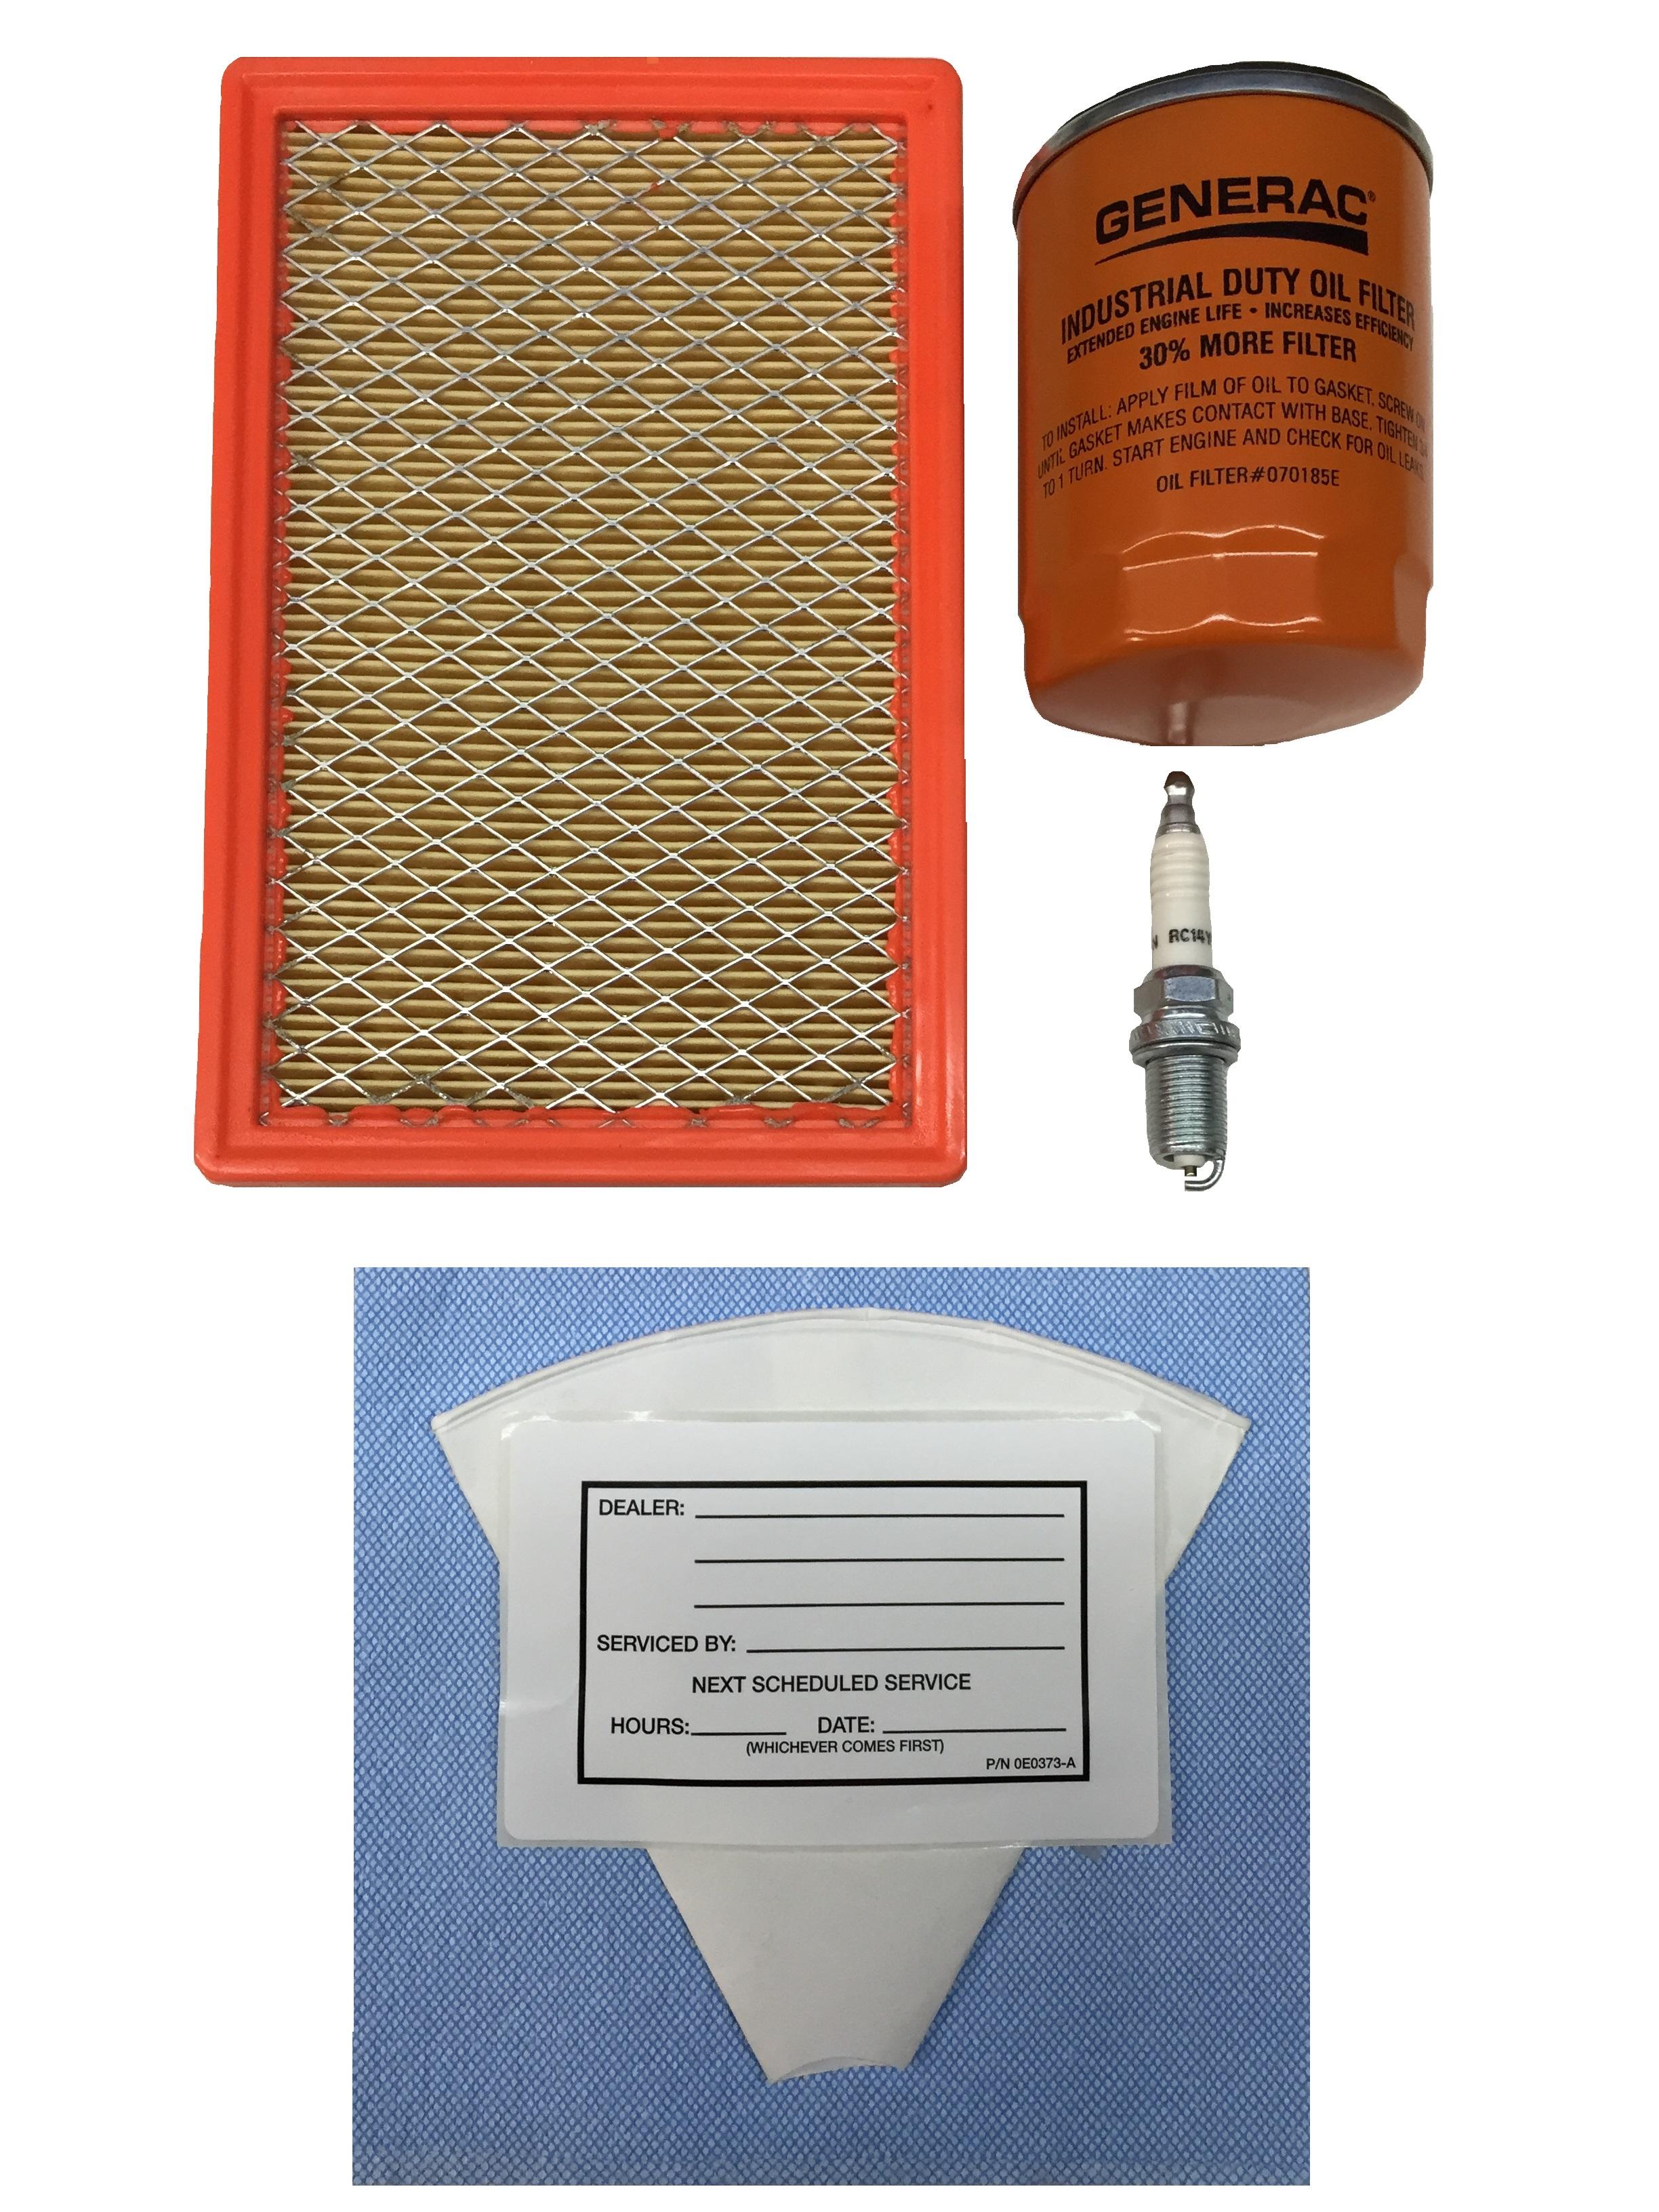 generac maintenance kit 8kw 410cc part 6482 ebay. Black Bedroom Furniture Sets. Home Design Ideas